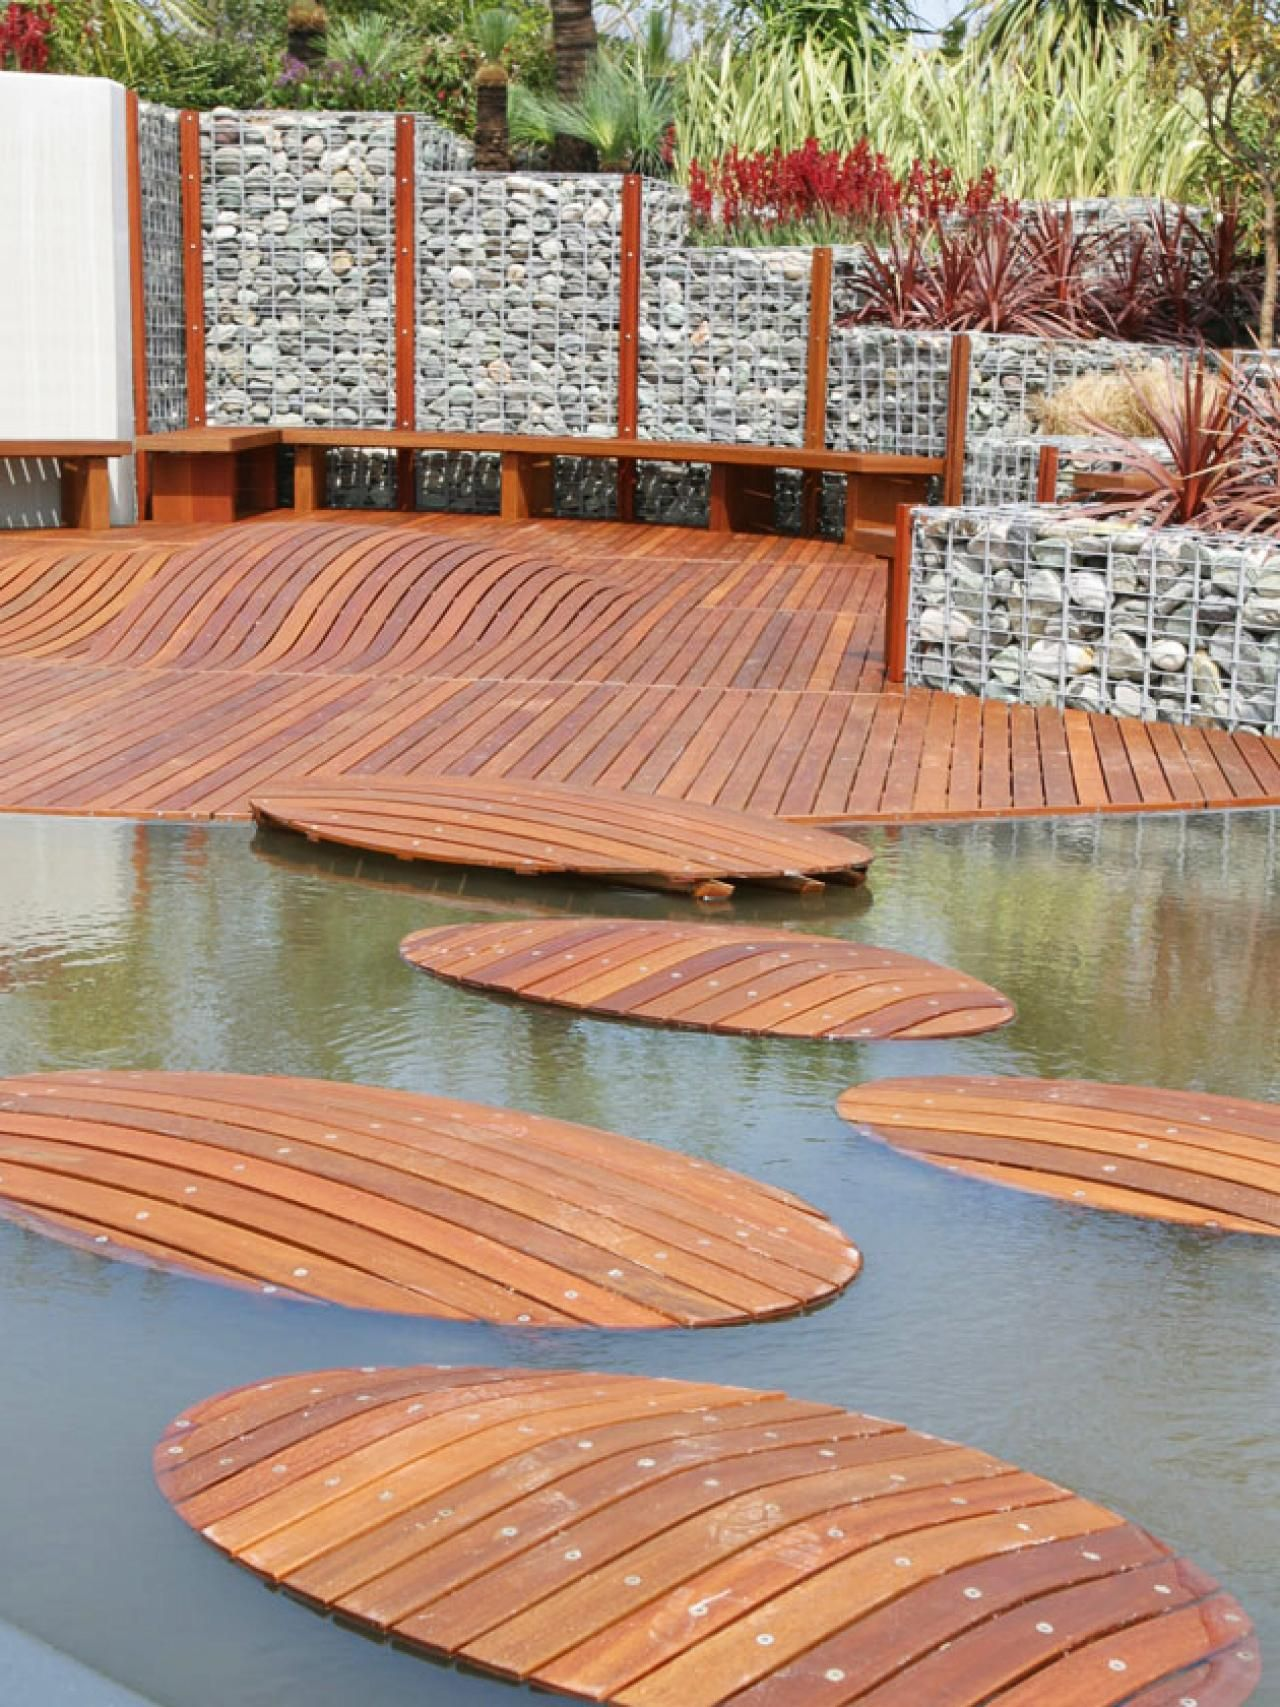 Innovative Design Ideas For Stunning Decks | Outdoor Spaces   Patio Ideas,  Decks U0026 Gardens